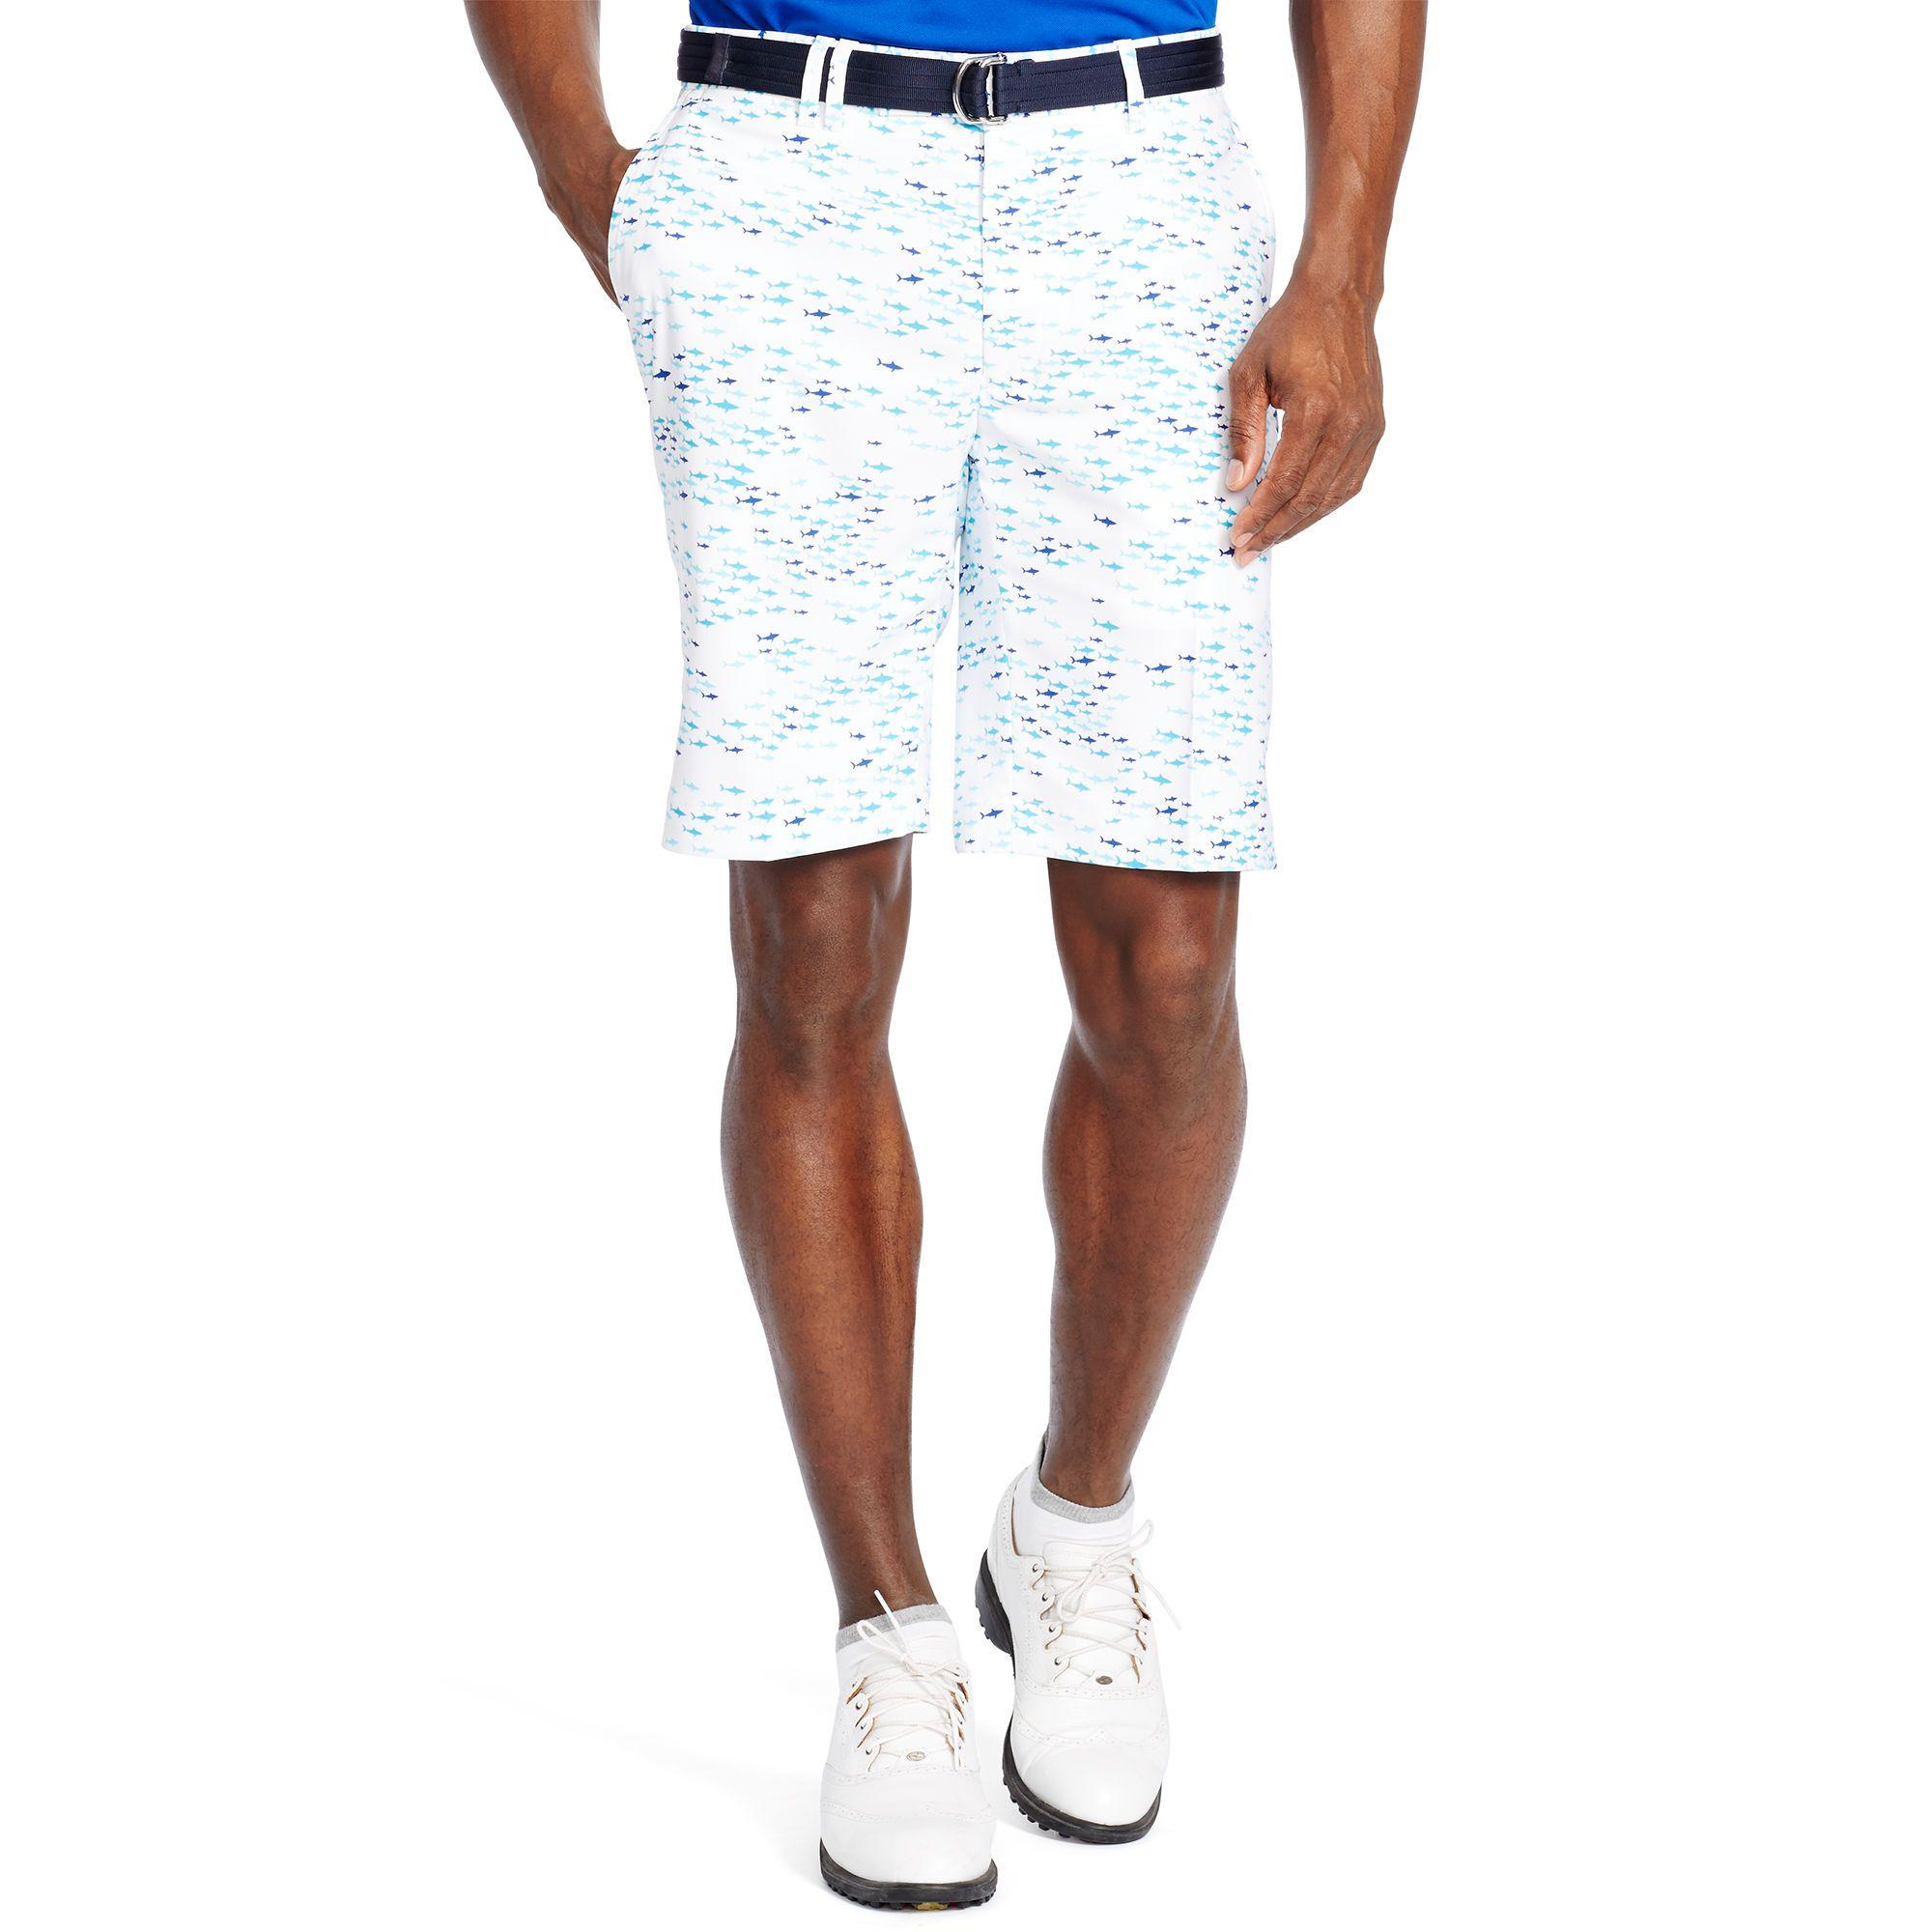 The Open Greens Short - Shorts  Pants & Shorts - RalphLauren.com